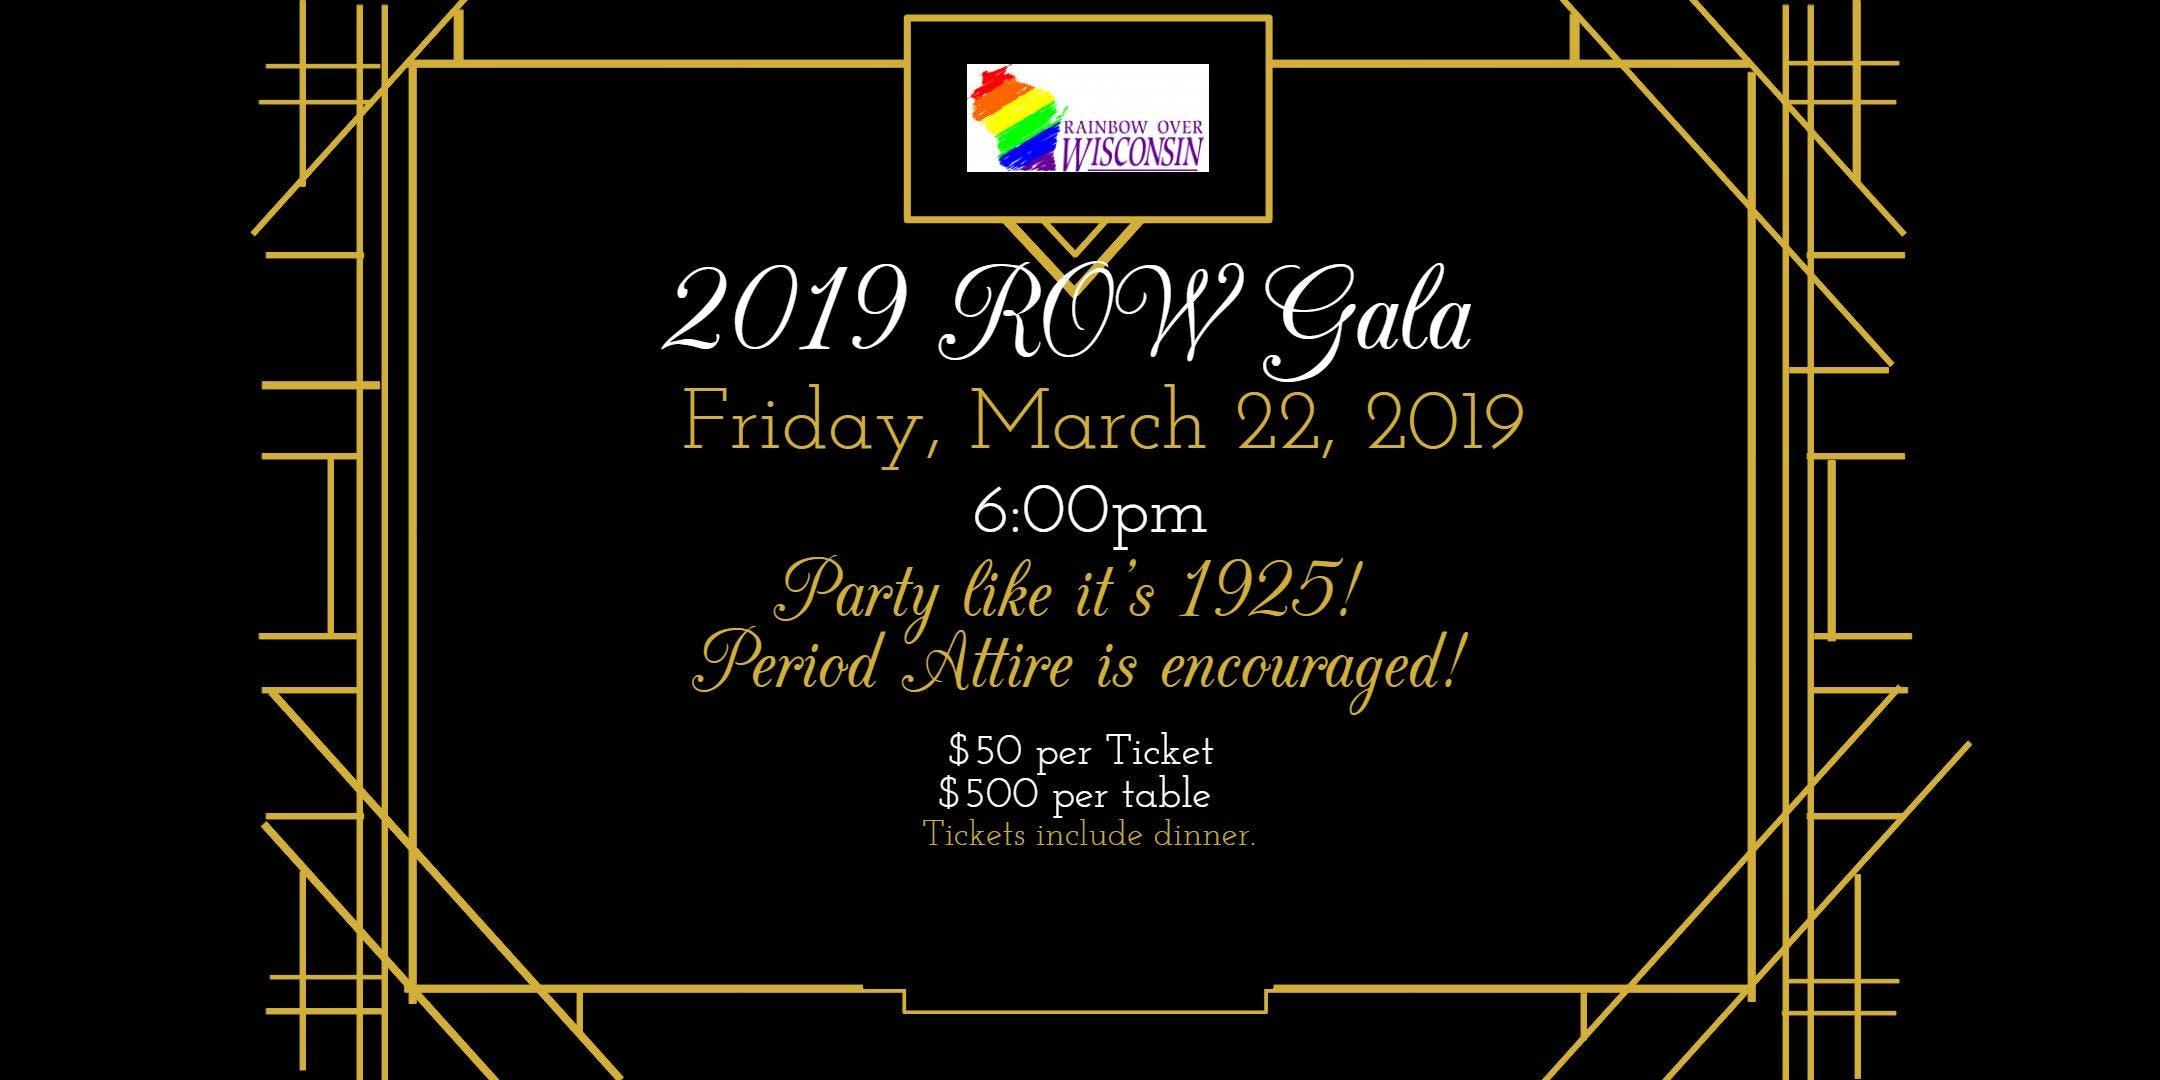 2019 Rainbow Over Wisconsin Annual Gala